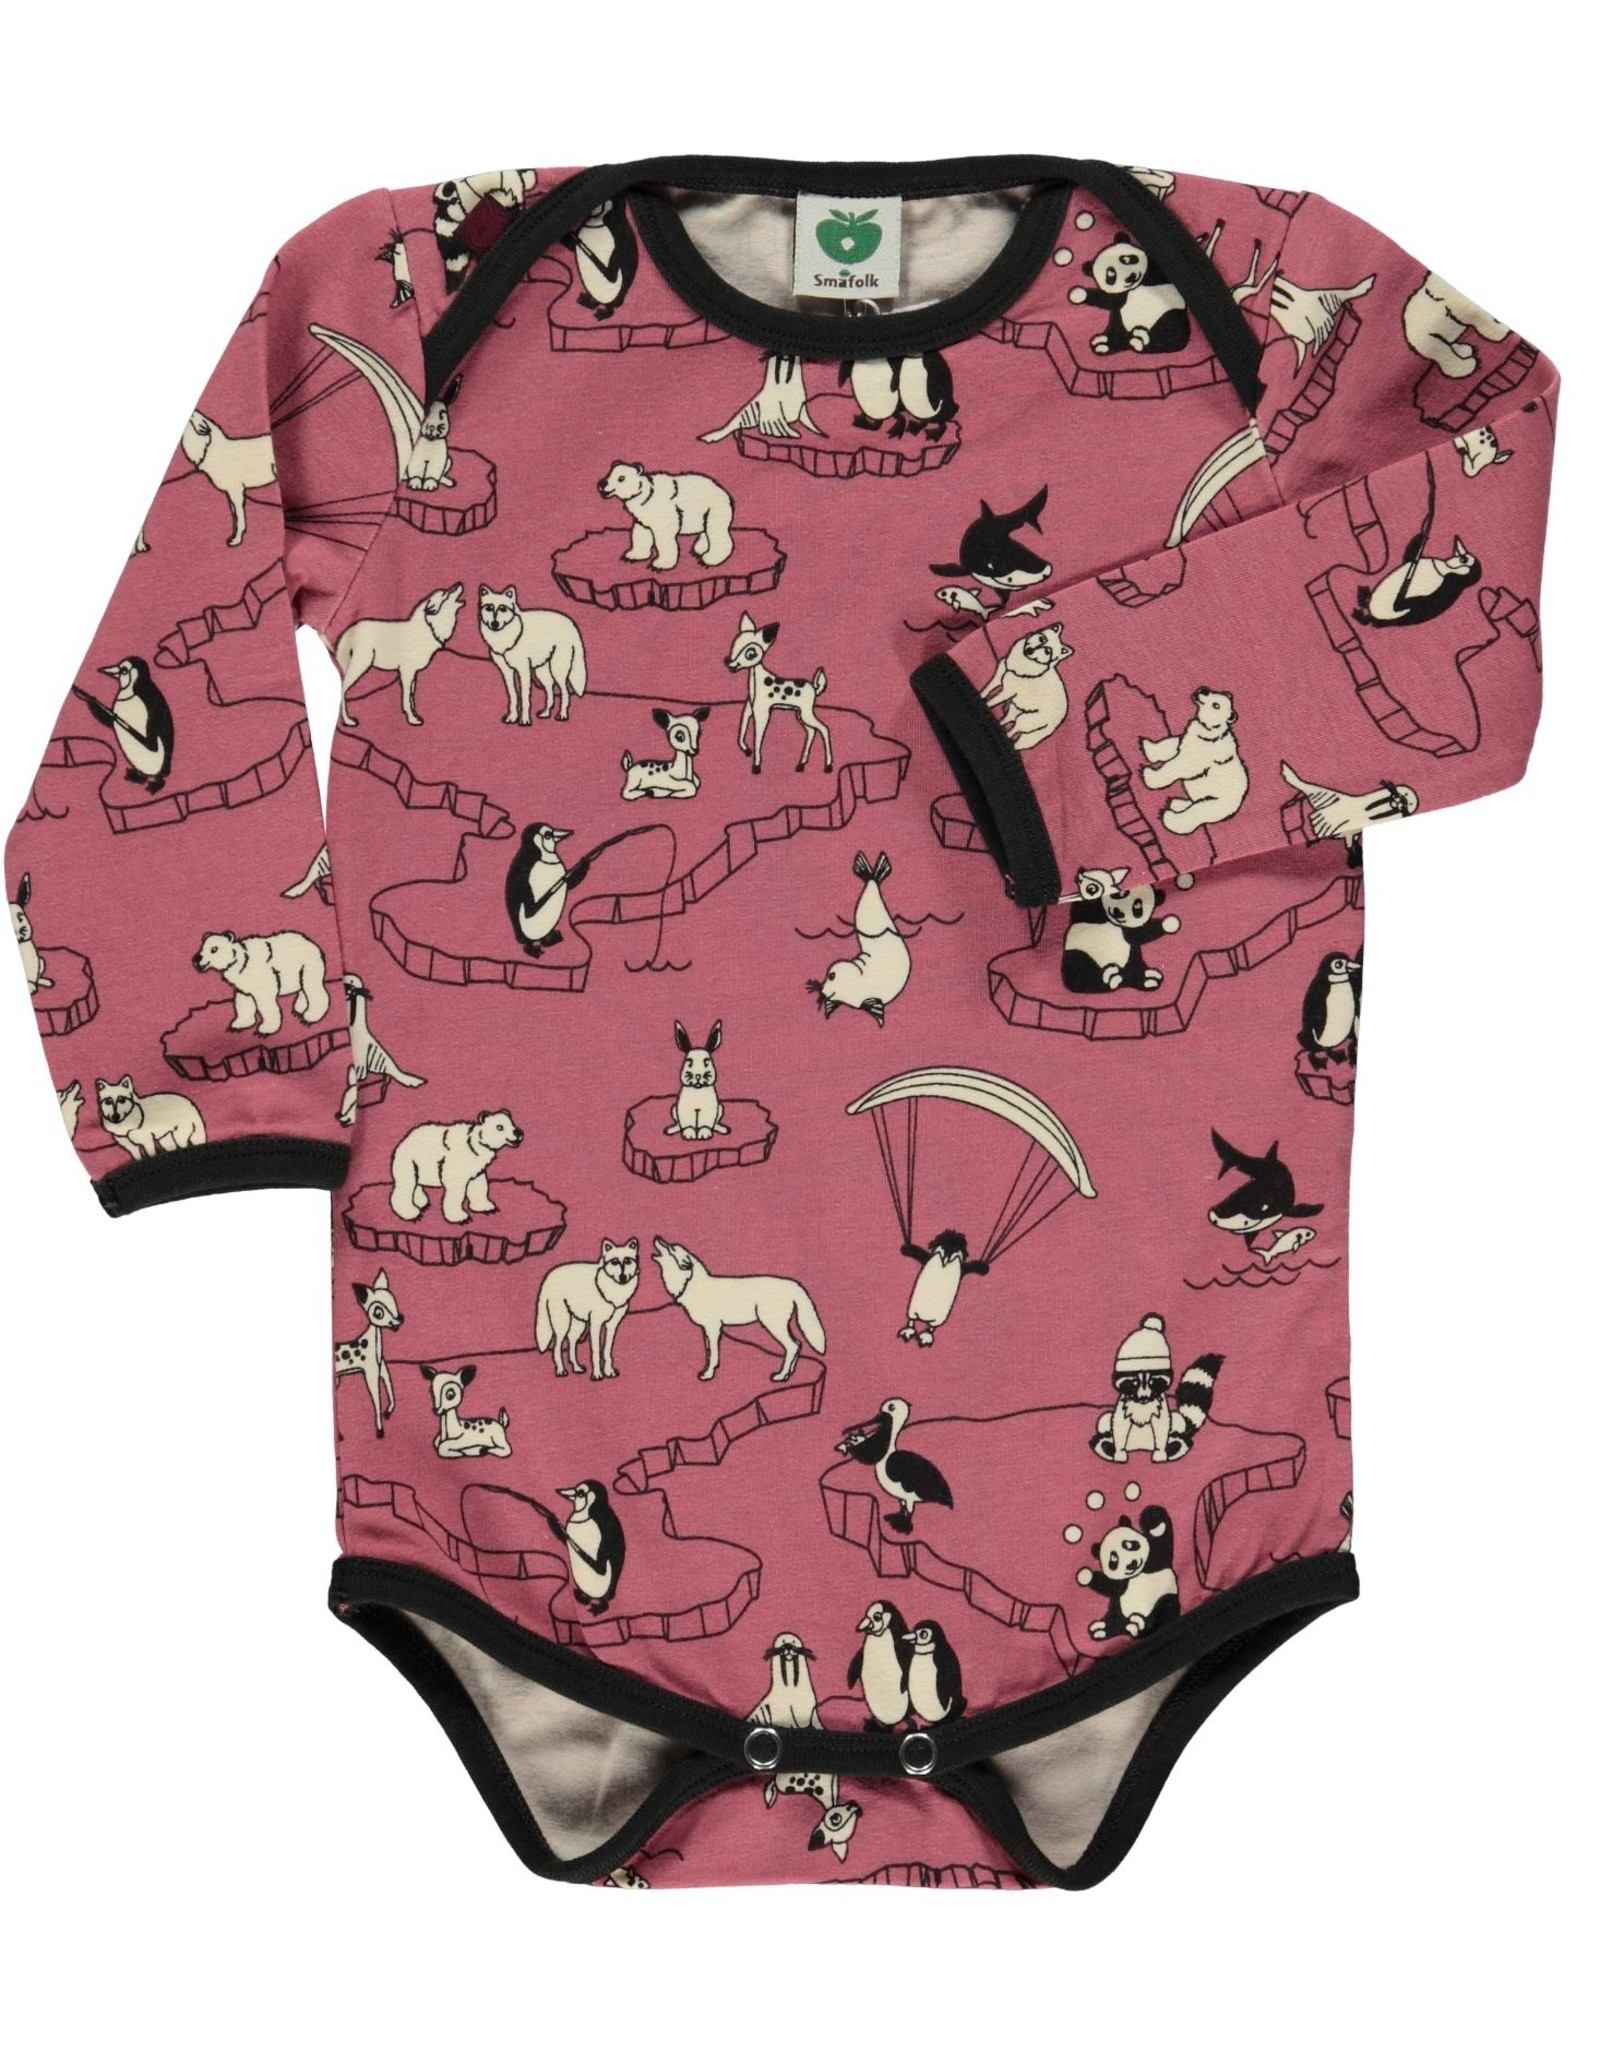 Smafolk Baby romper - pink polar animals